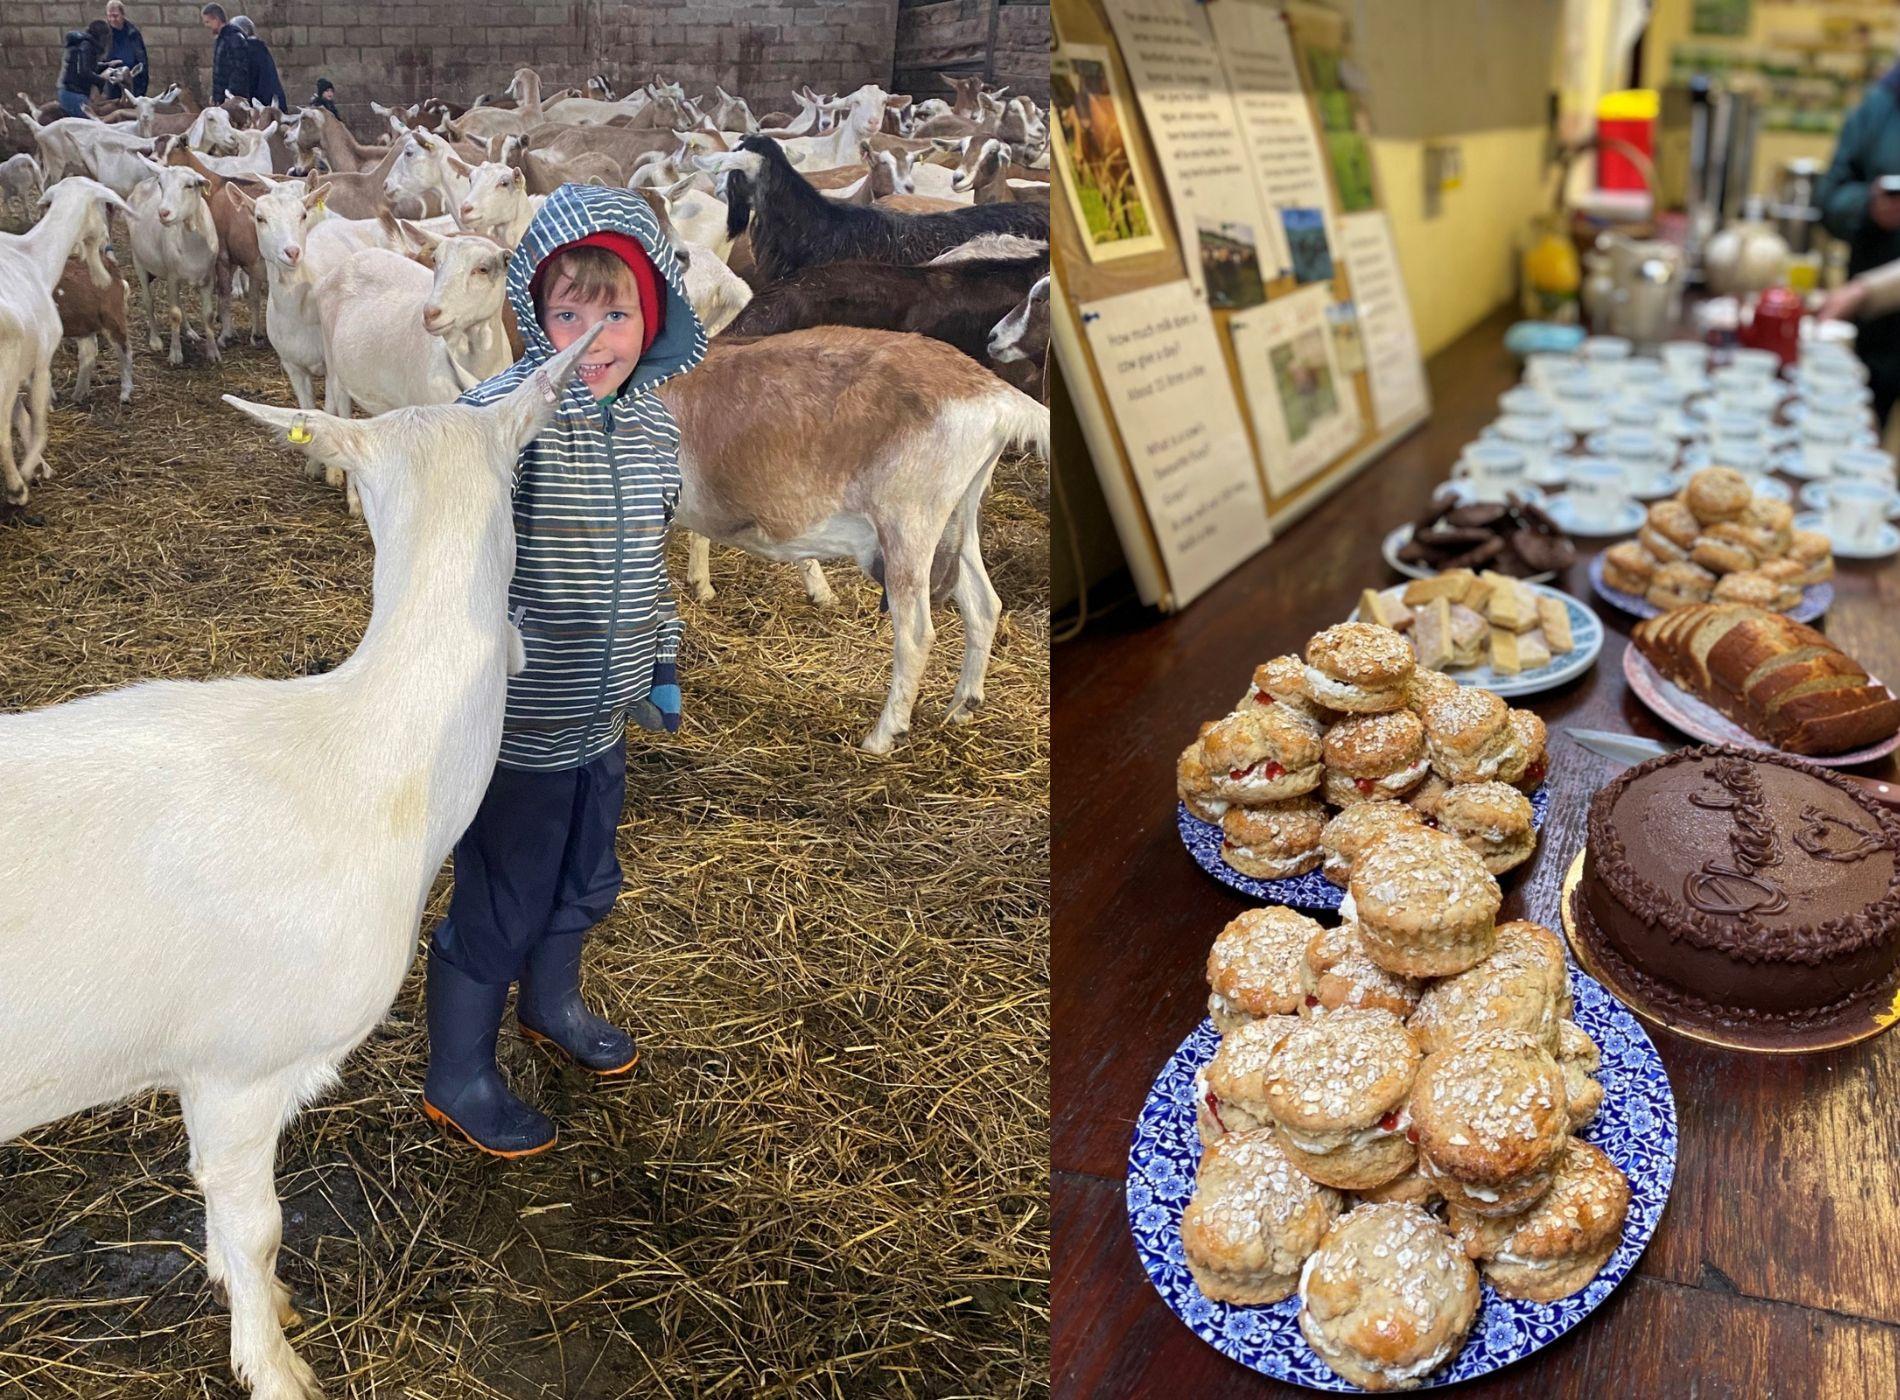 Child, goat and tea